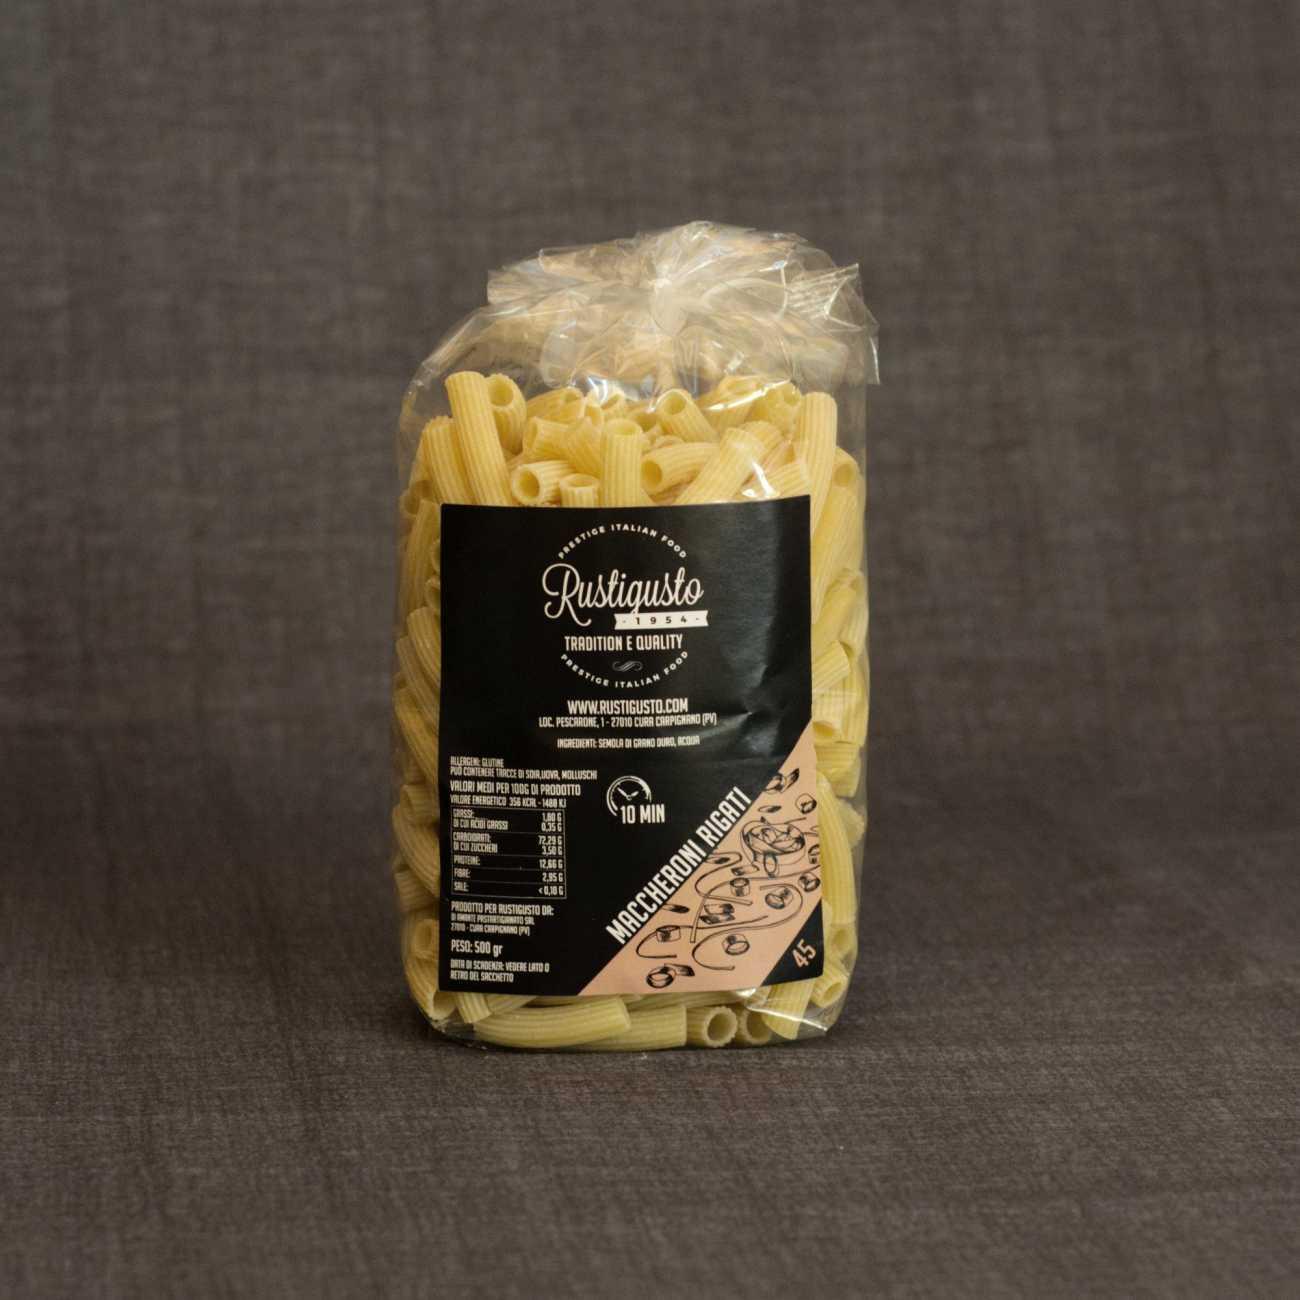 Maccheroni rigati - Pasta